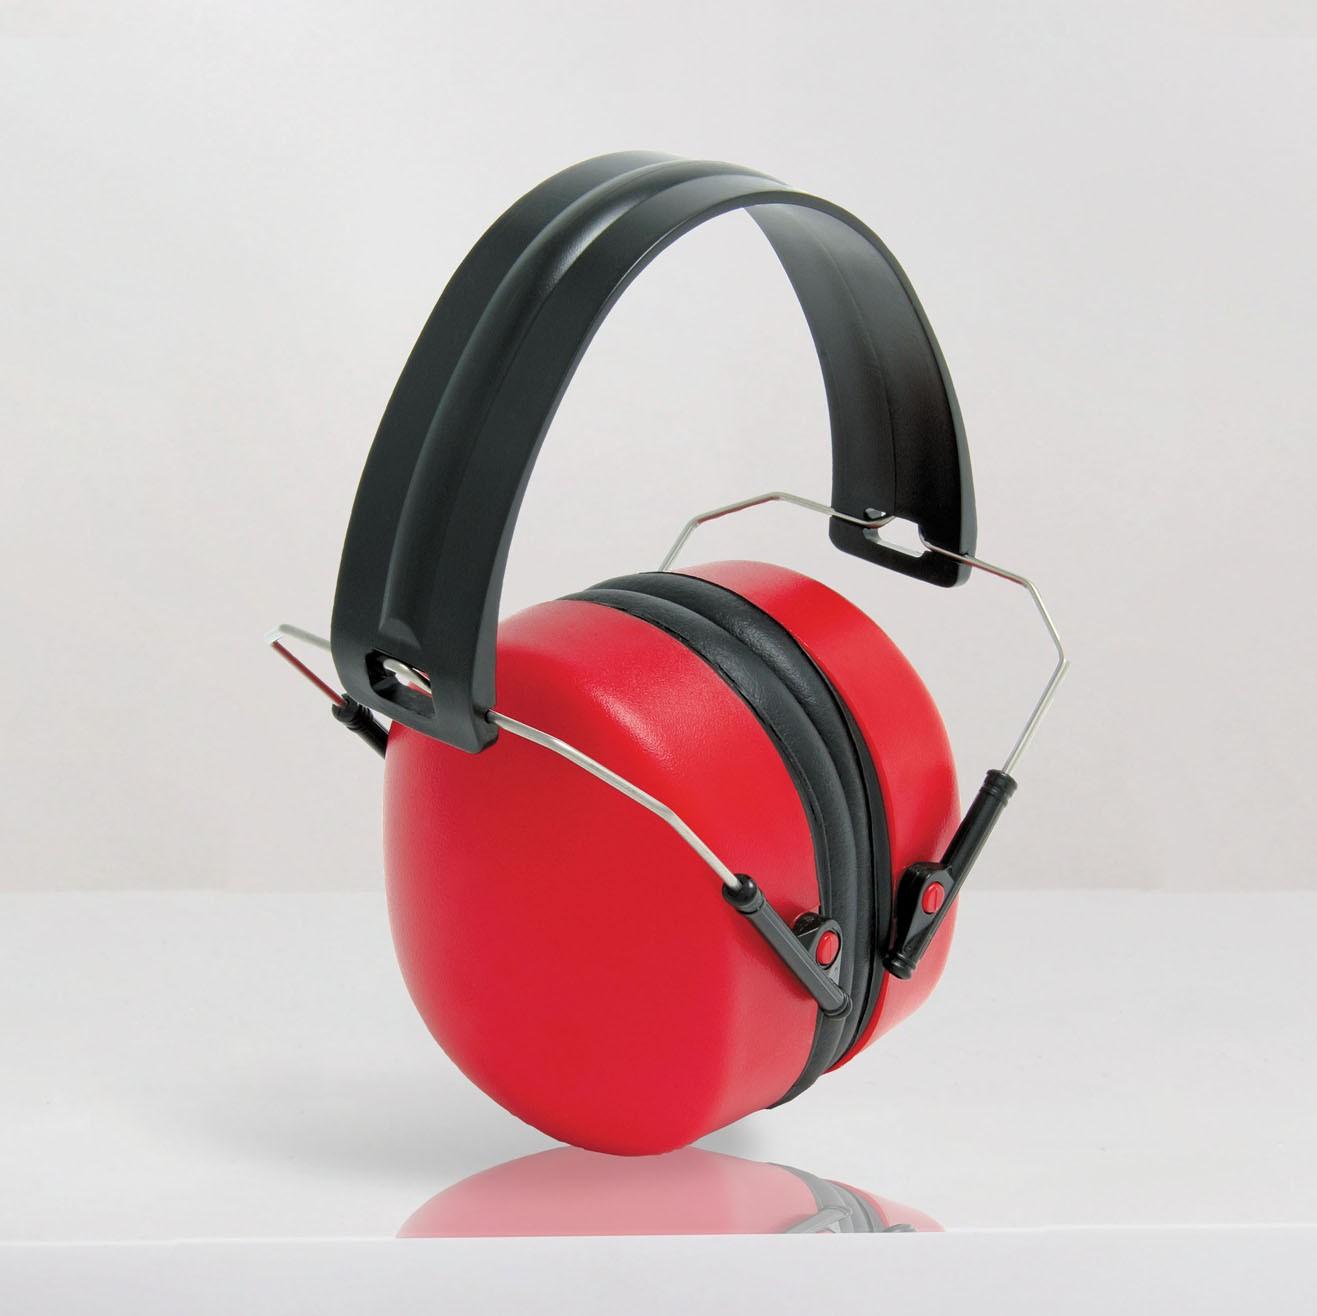 Folding Ear Defender - packaged